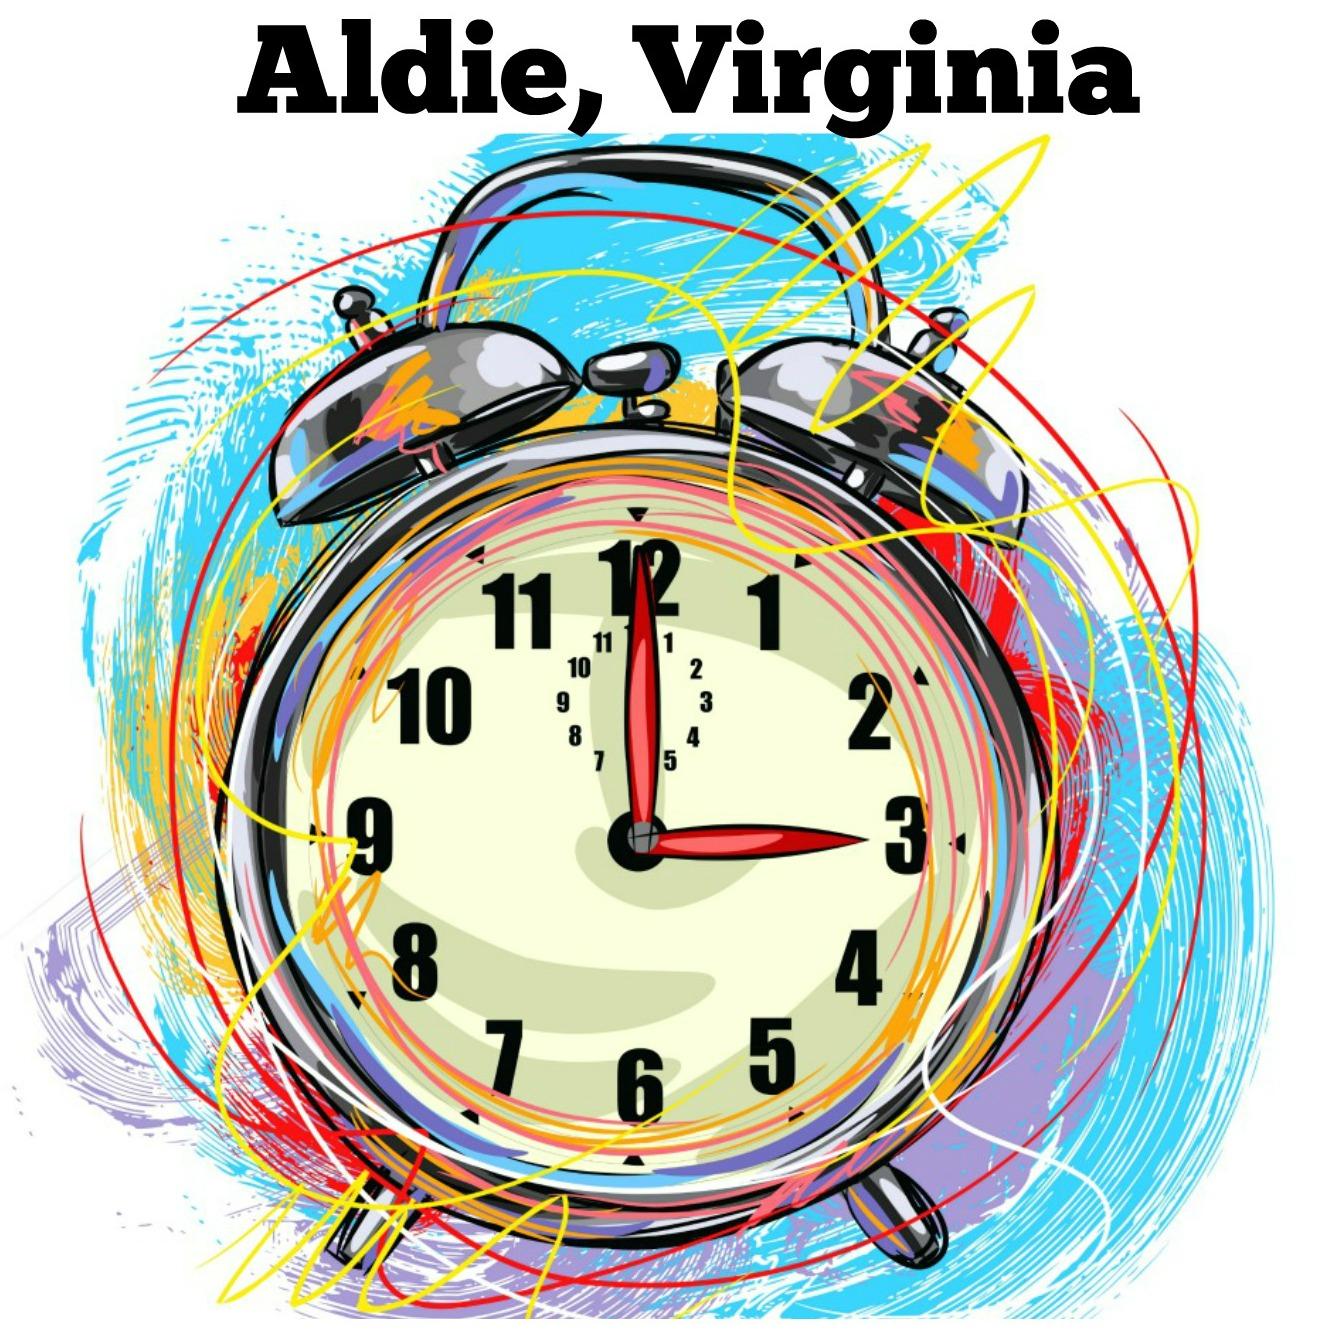 Homes for Sale in Aldie, Virginia